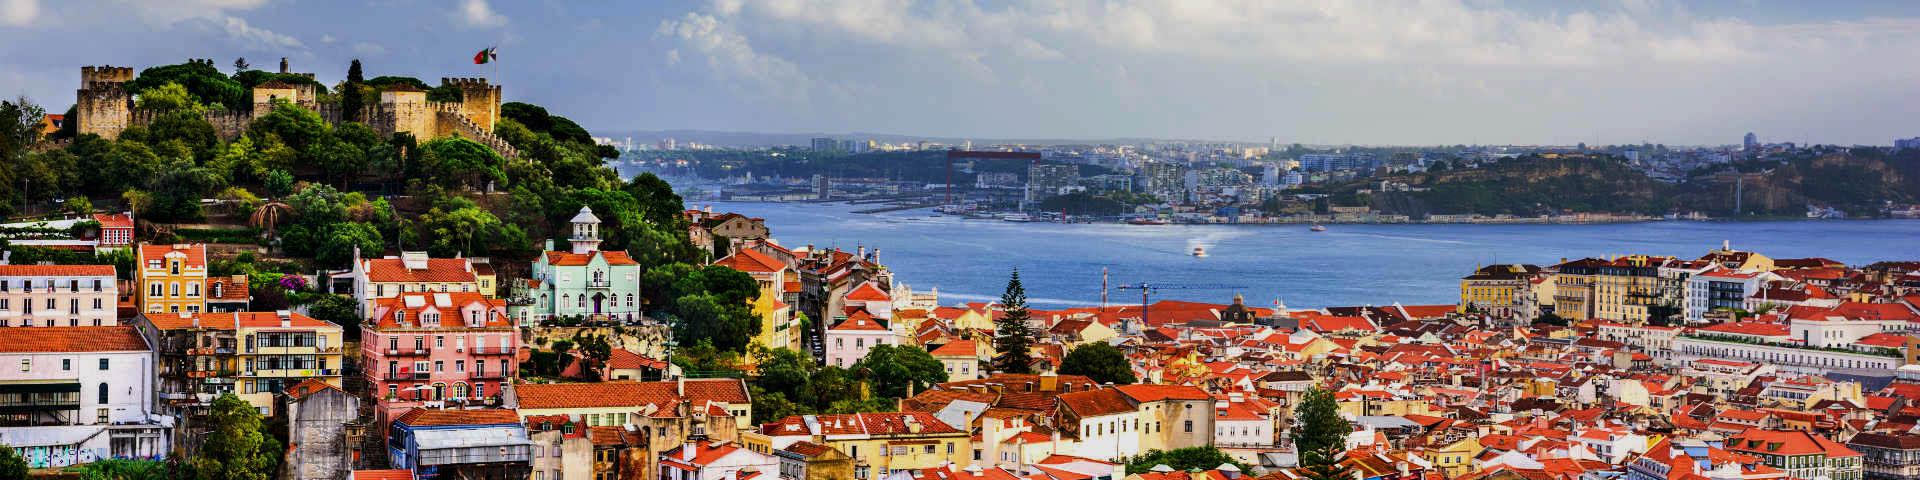 Lisbon hero edit